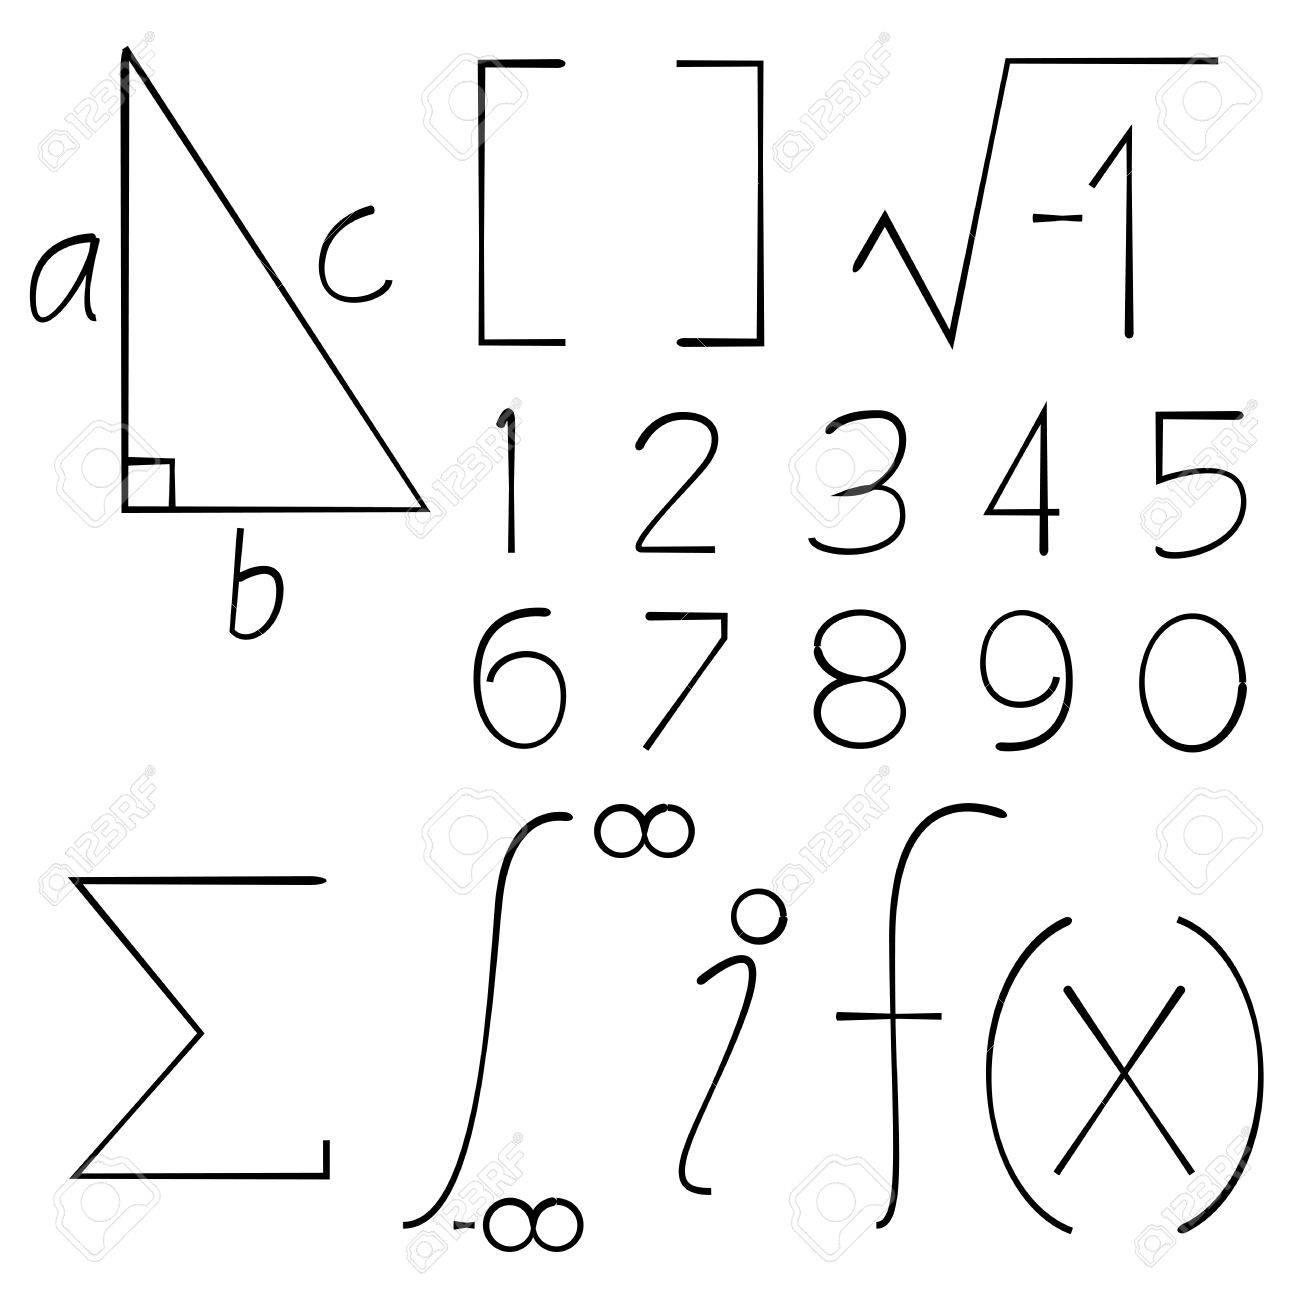 Math symbols royalty free cliparts vectors and stock illustration math symbols stock vector 71317658 buycottarizona Image collections